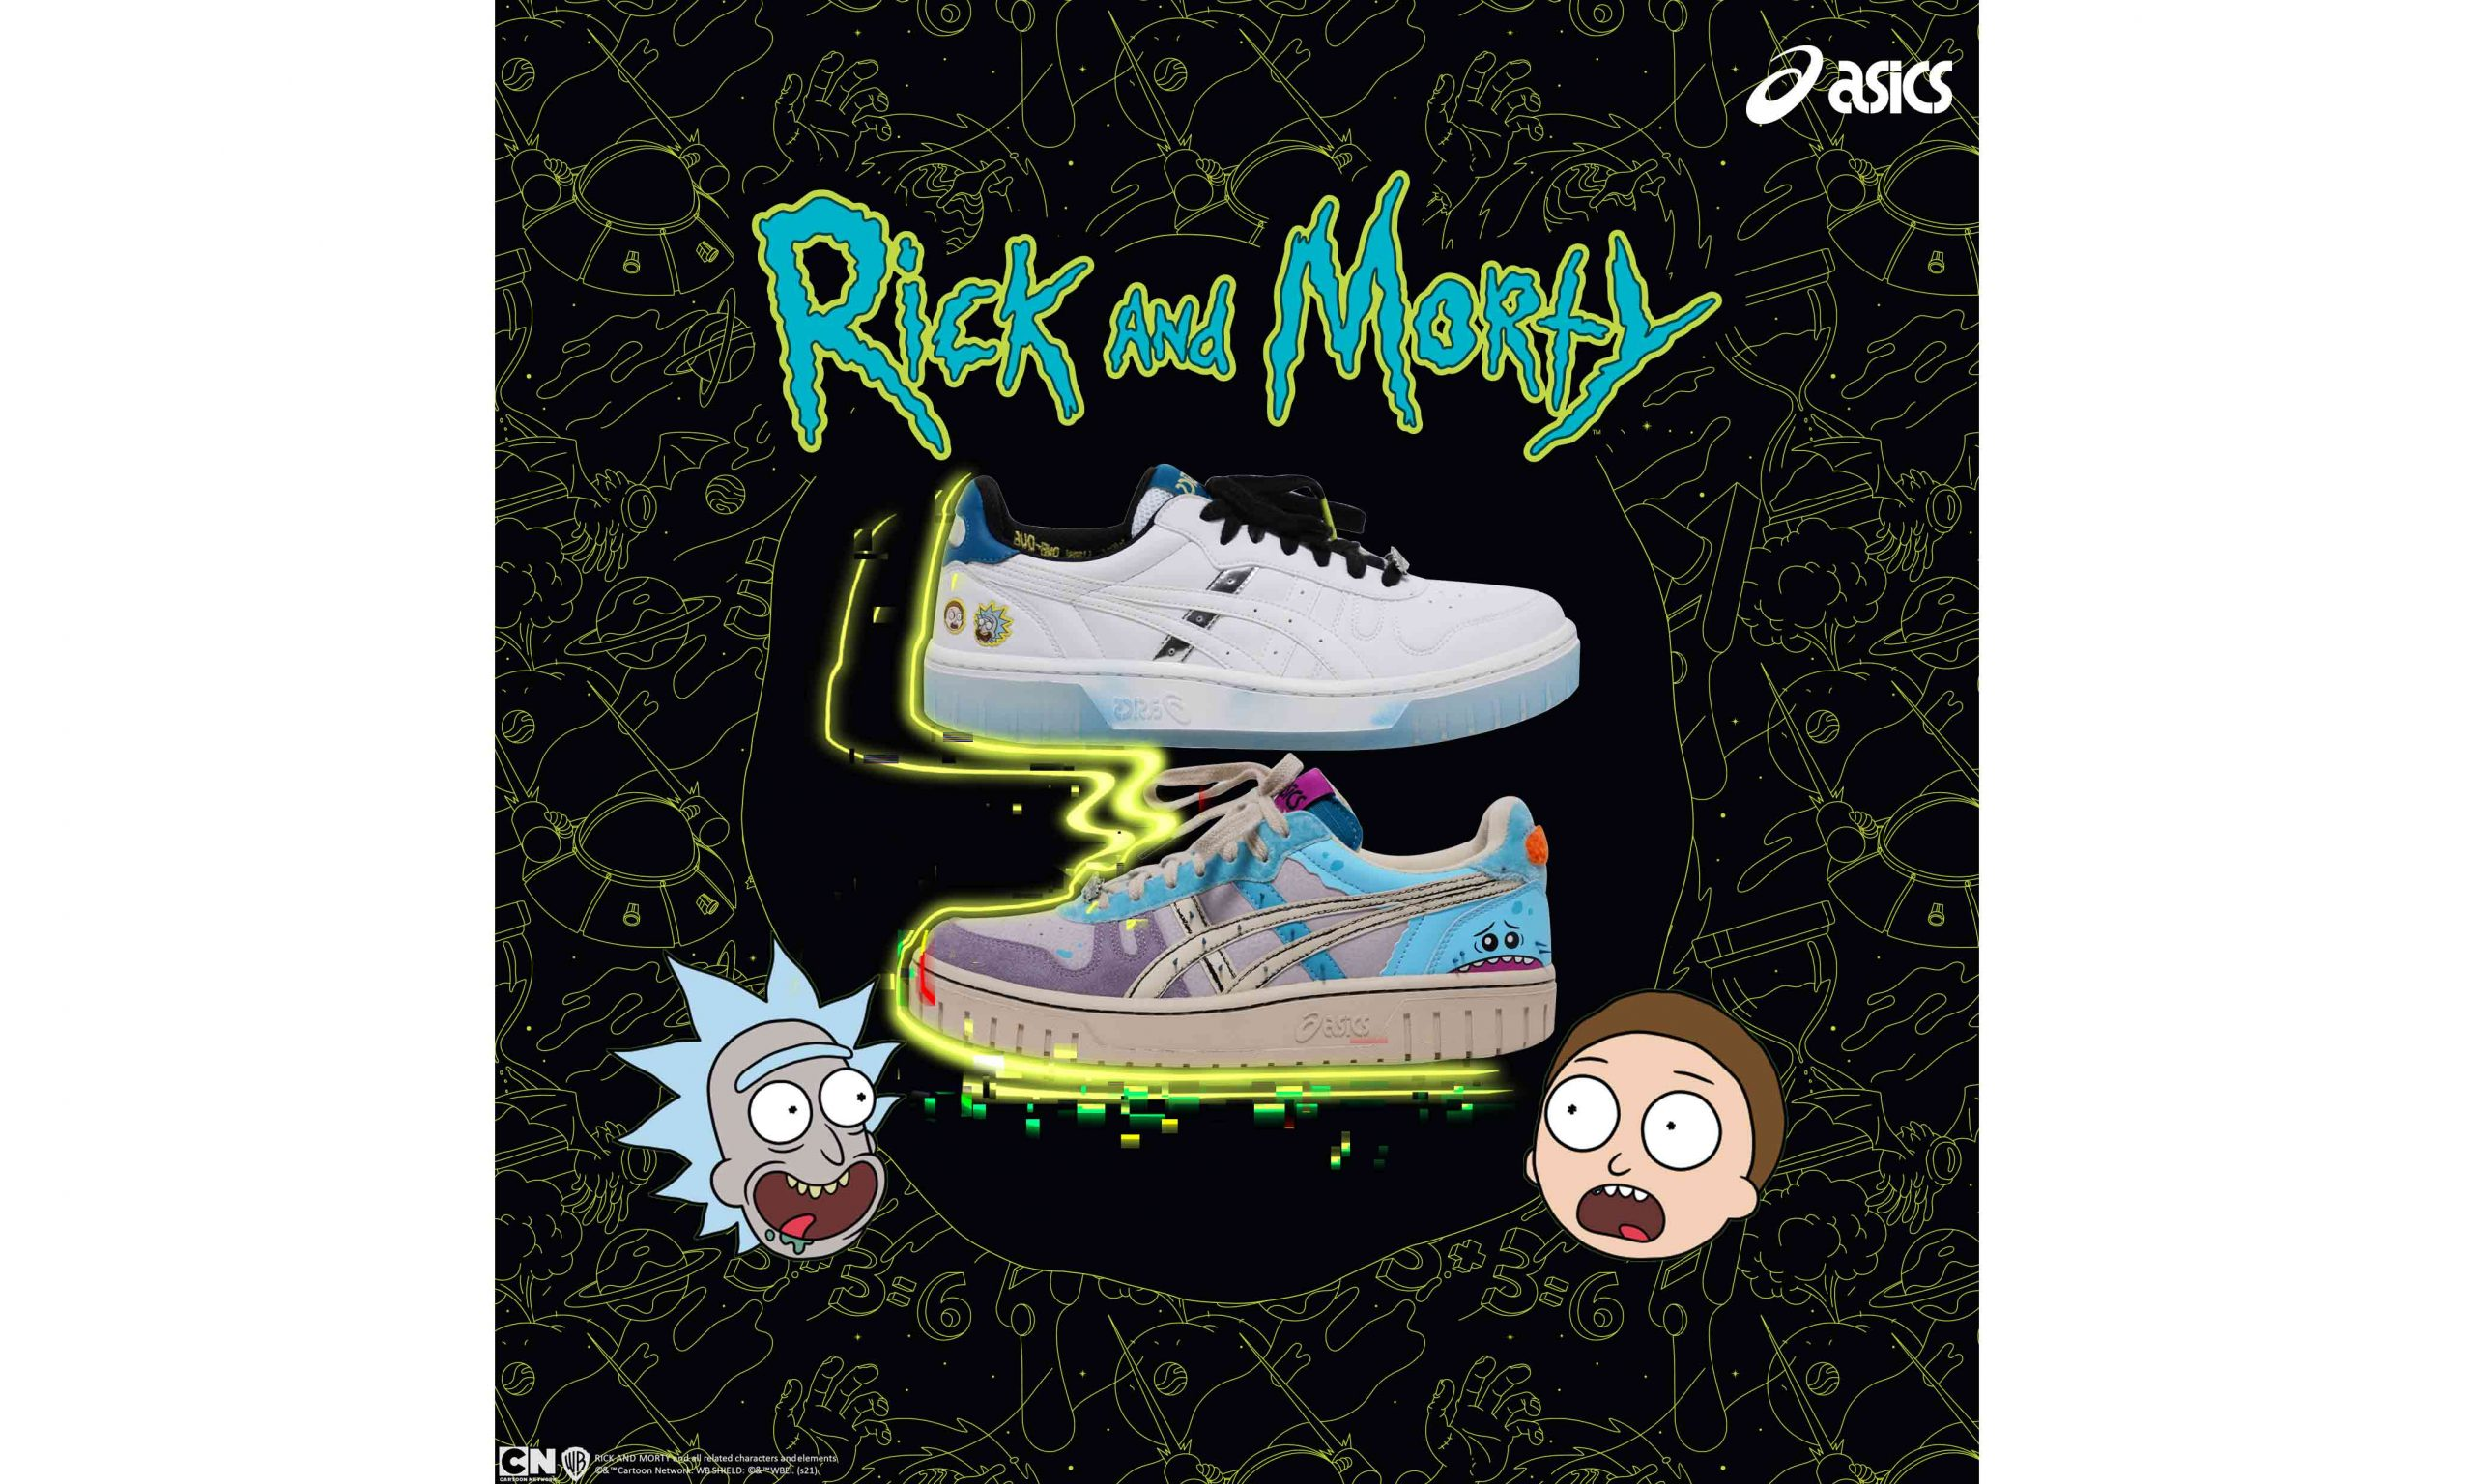 踏上星际冒险旅程,ASICS 携手 Rick and Morty 打造联名系列